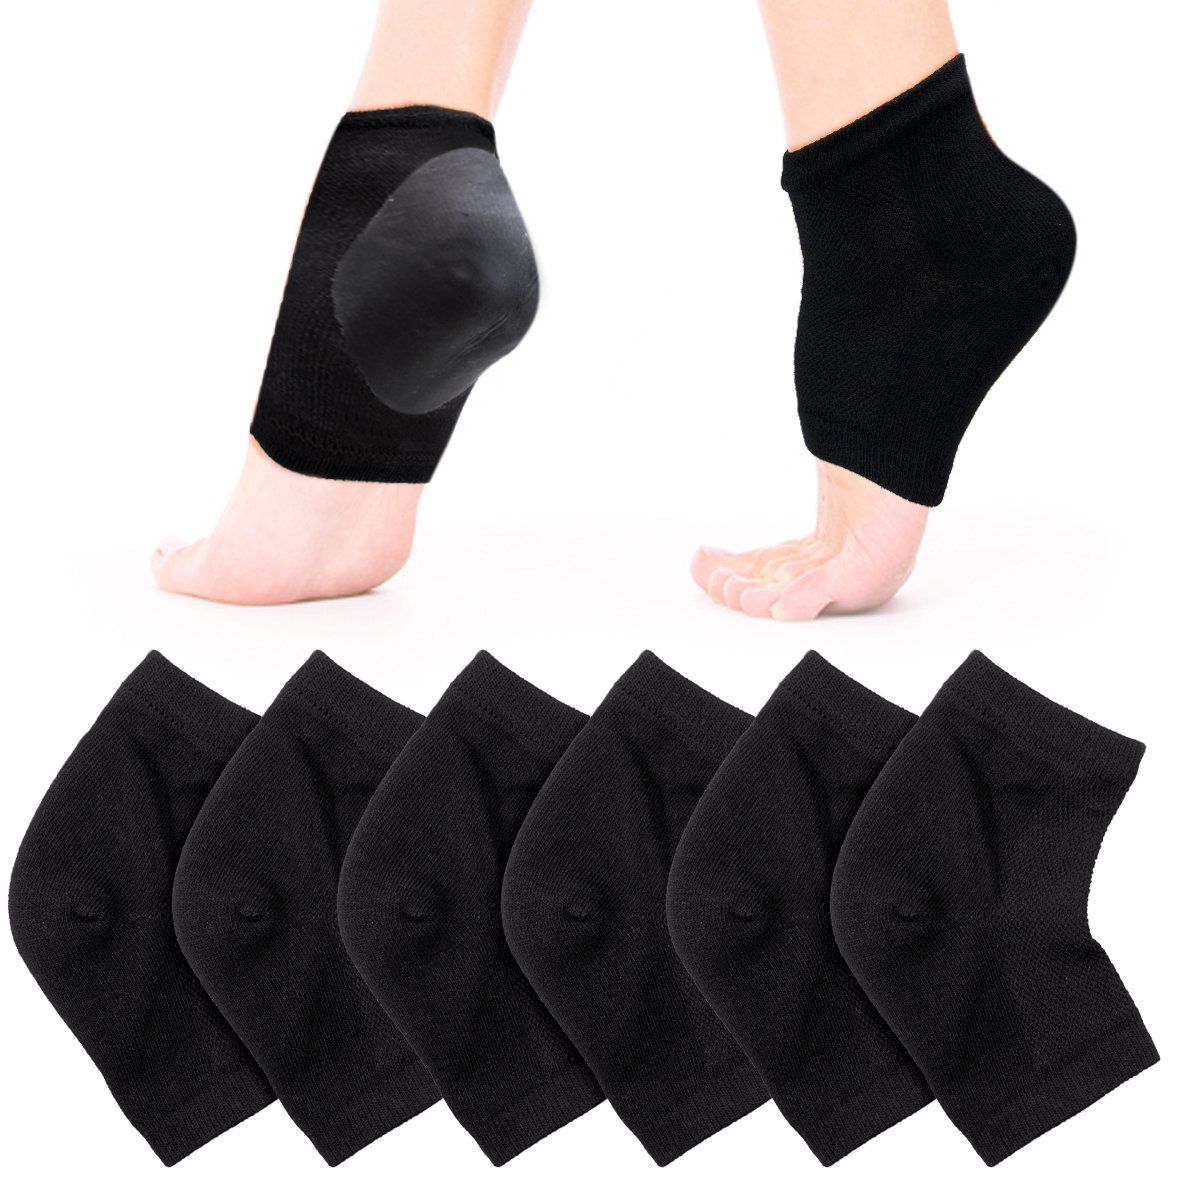 CIEHER 3 Pairs Open Toe Heel Socks for Dry Hard Cracked Skin Moisturizing Cracked Heel Socks Gel Heel Socks